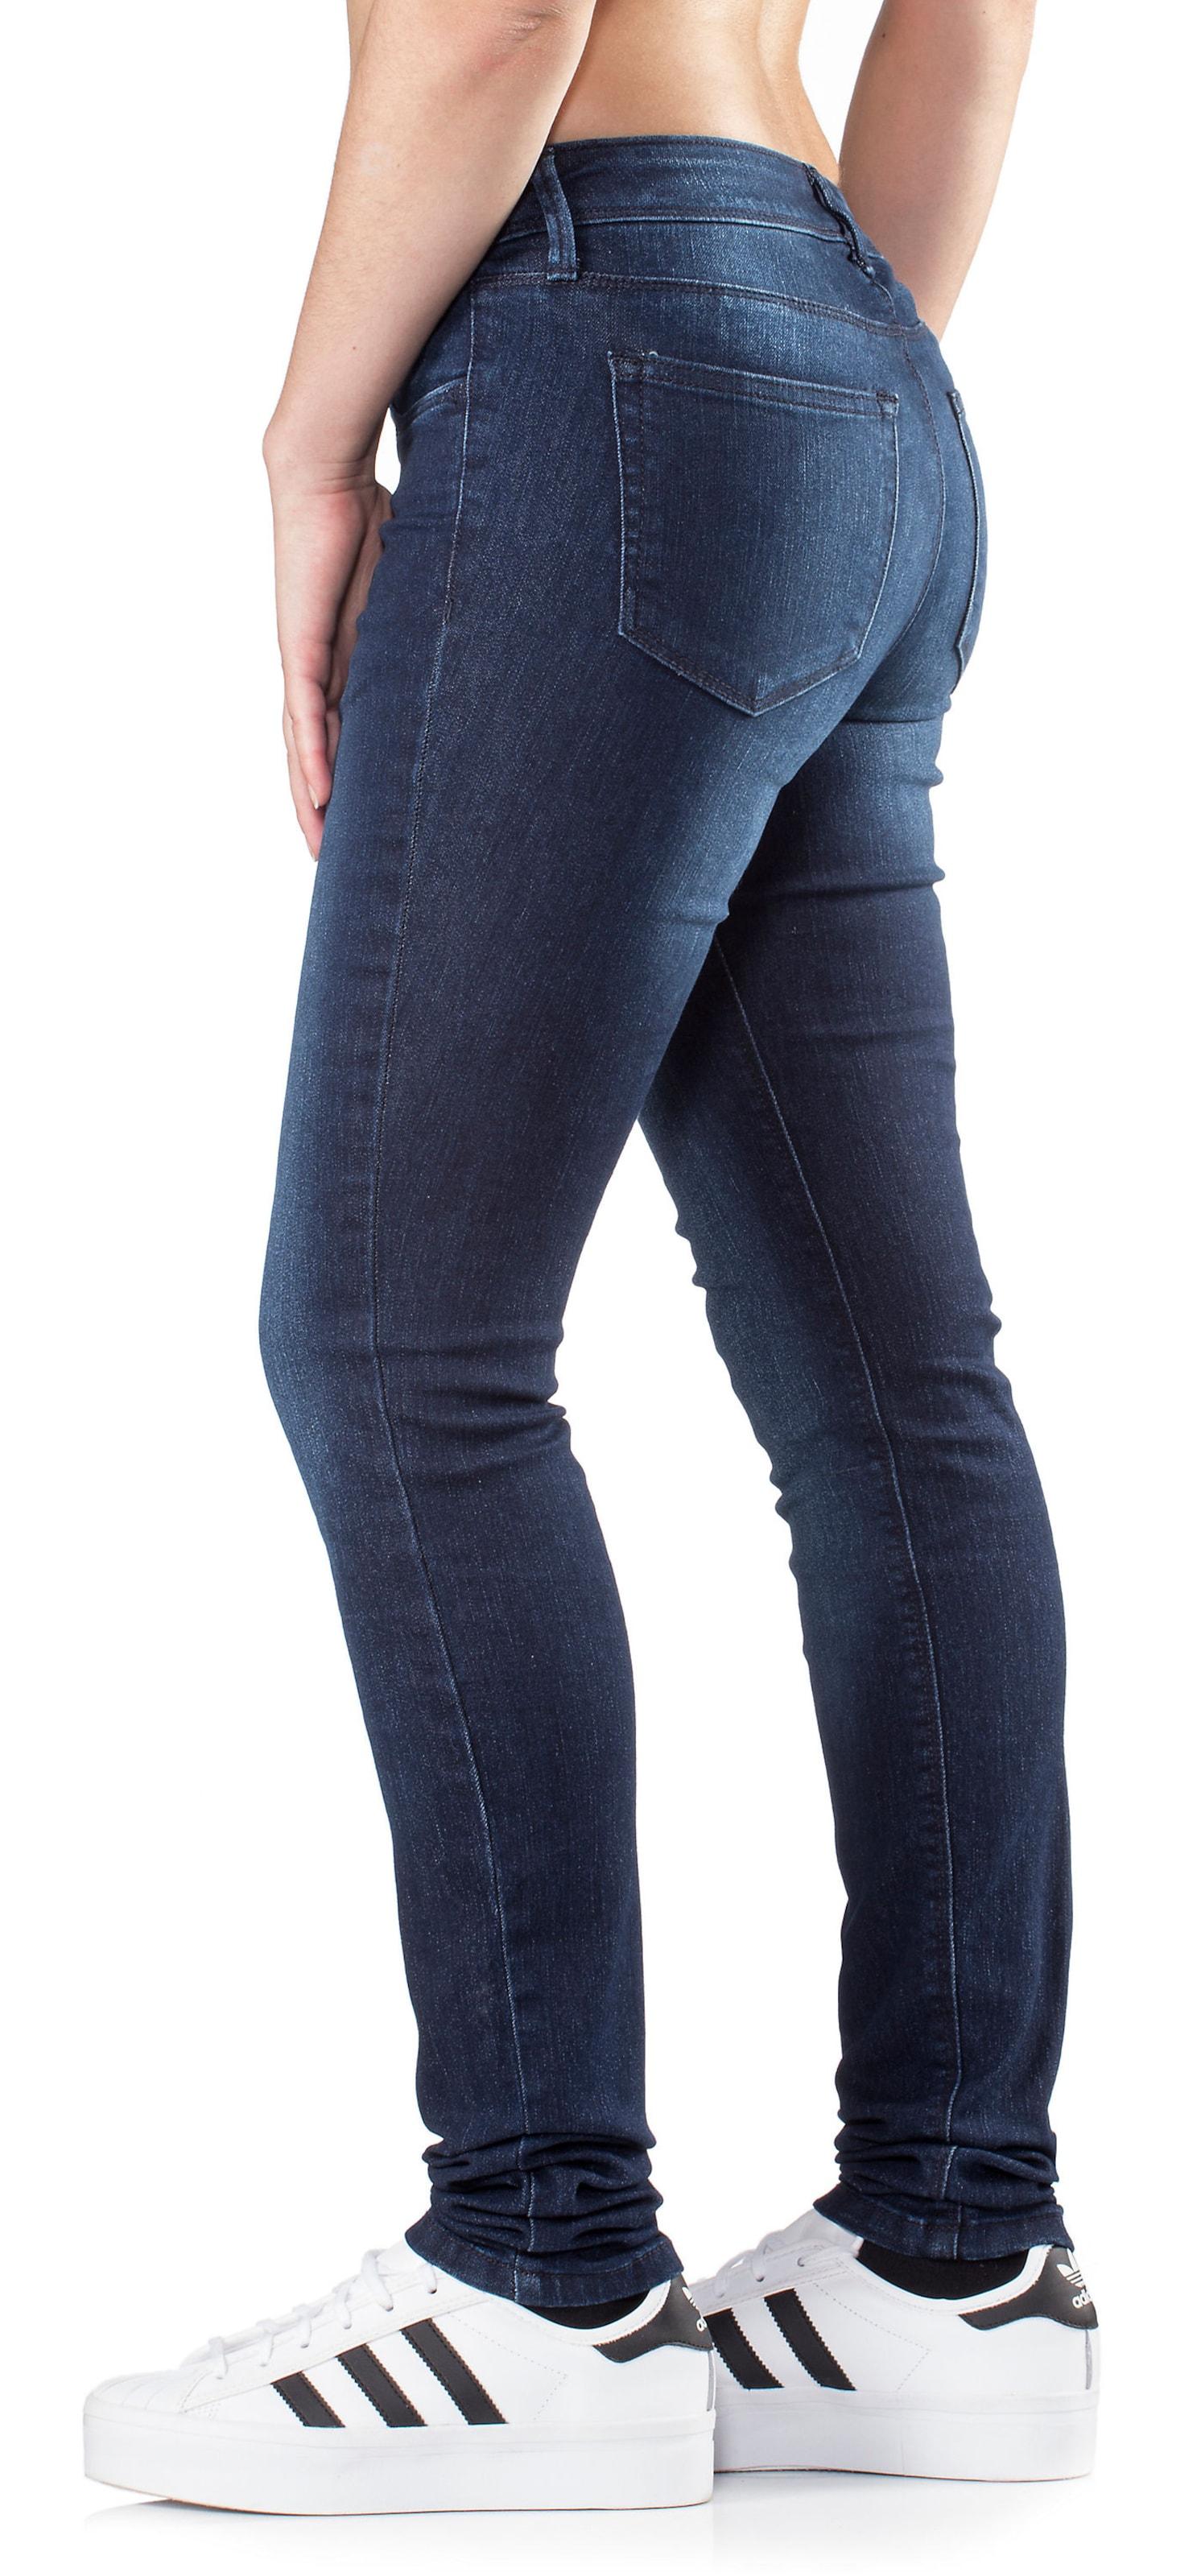 Billig Verkaufen Mode-Stil Rabatt Perfekt TOM TAILOR DENIM Skinny Jeans 'Jona' Billig Verkauf Breite Palette Von RzthtEF